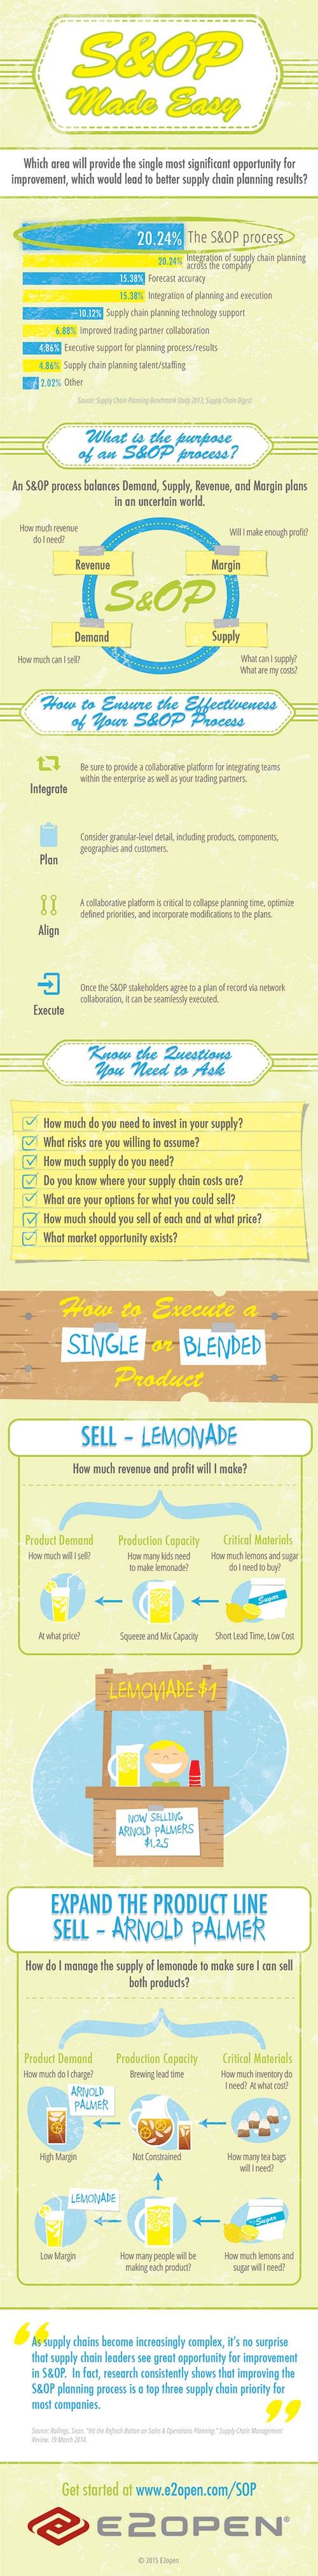 E2open - S&OP Made Easy (Lemonade Stand)